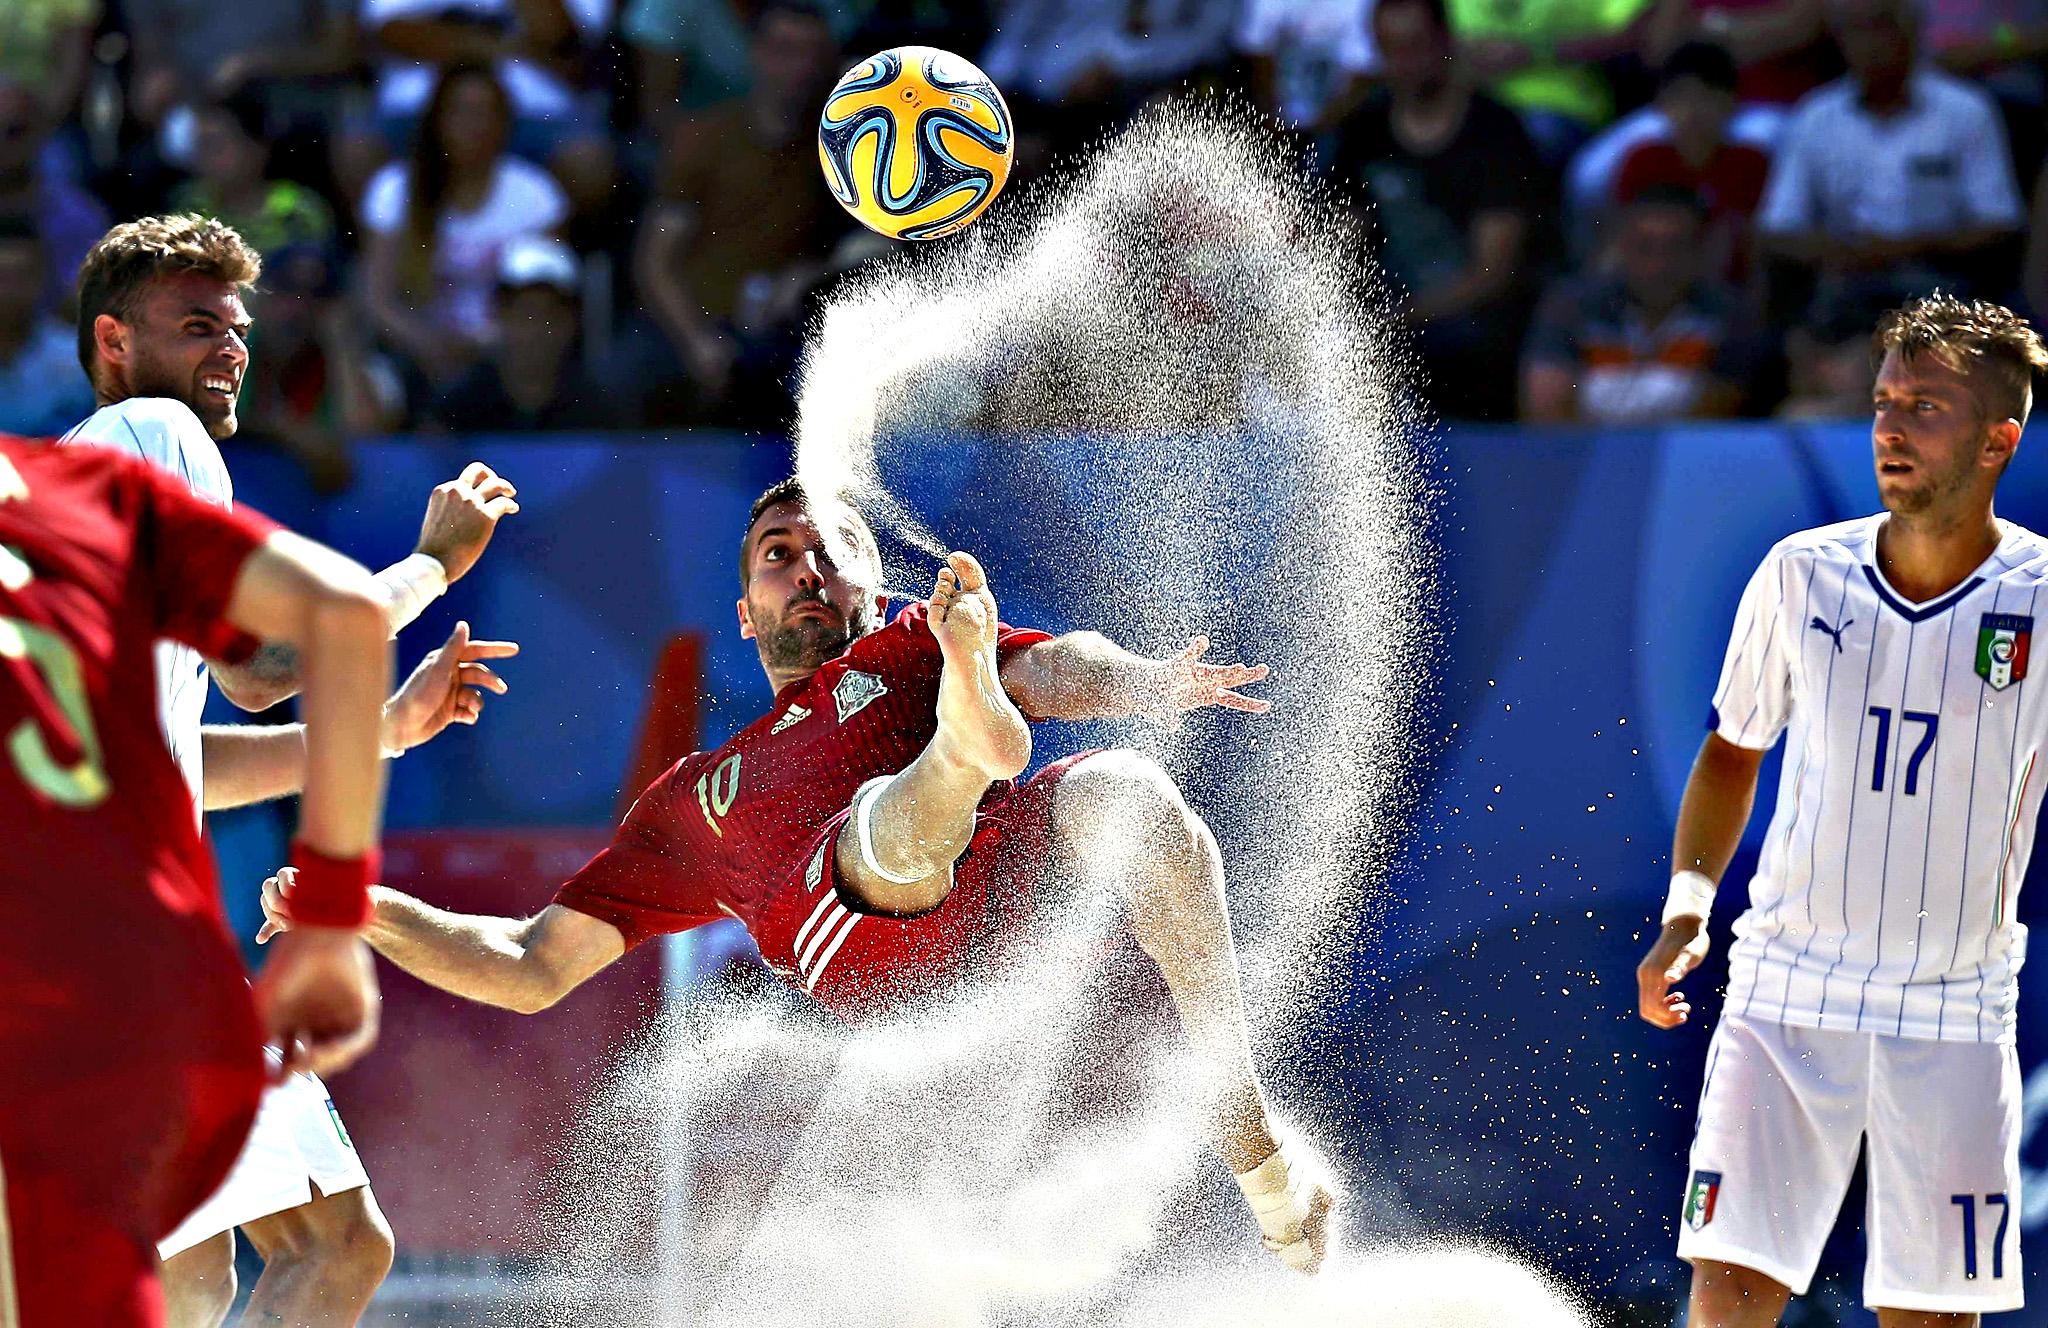 Llorenc Gomez of Spain kicks the ball next to Simone Marinai of Italy during their group stage beach football match at the 1st European Games in Baku, Azerbaijan, June 24, 2015.